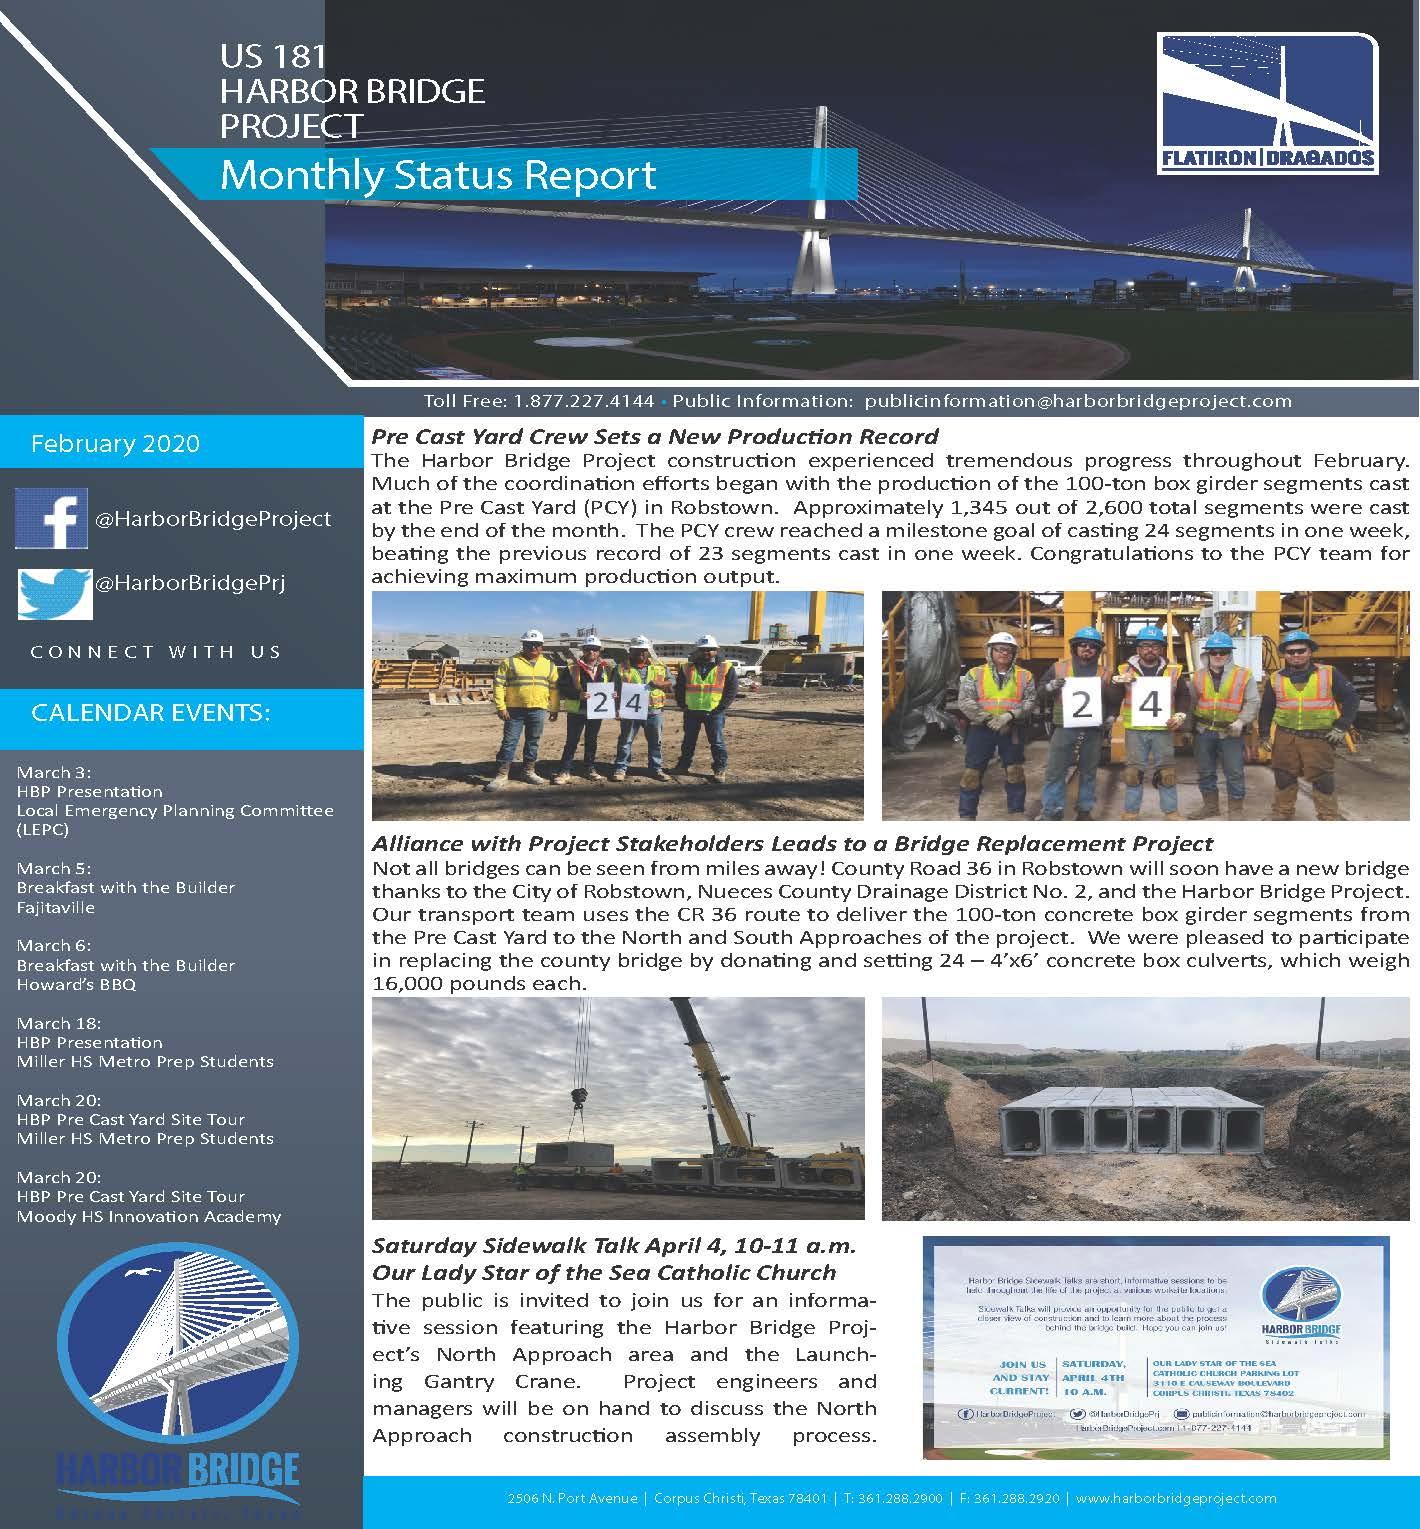 February 2020 Monthly Status Report